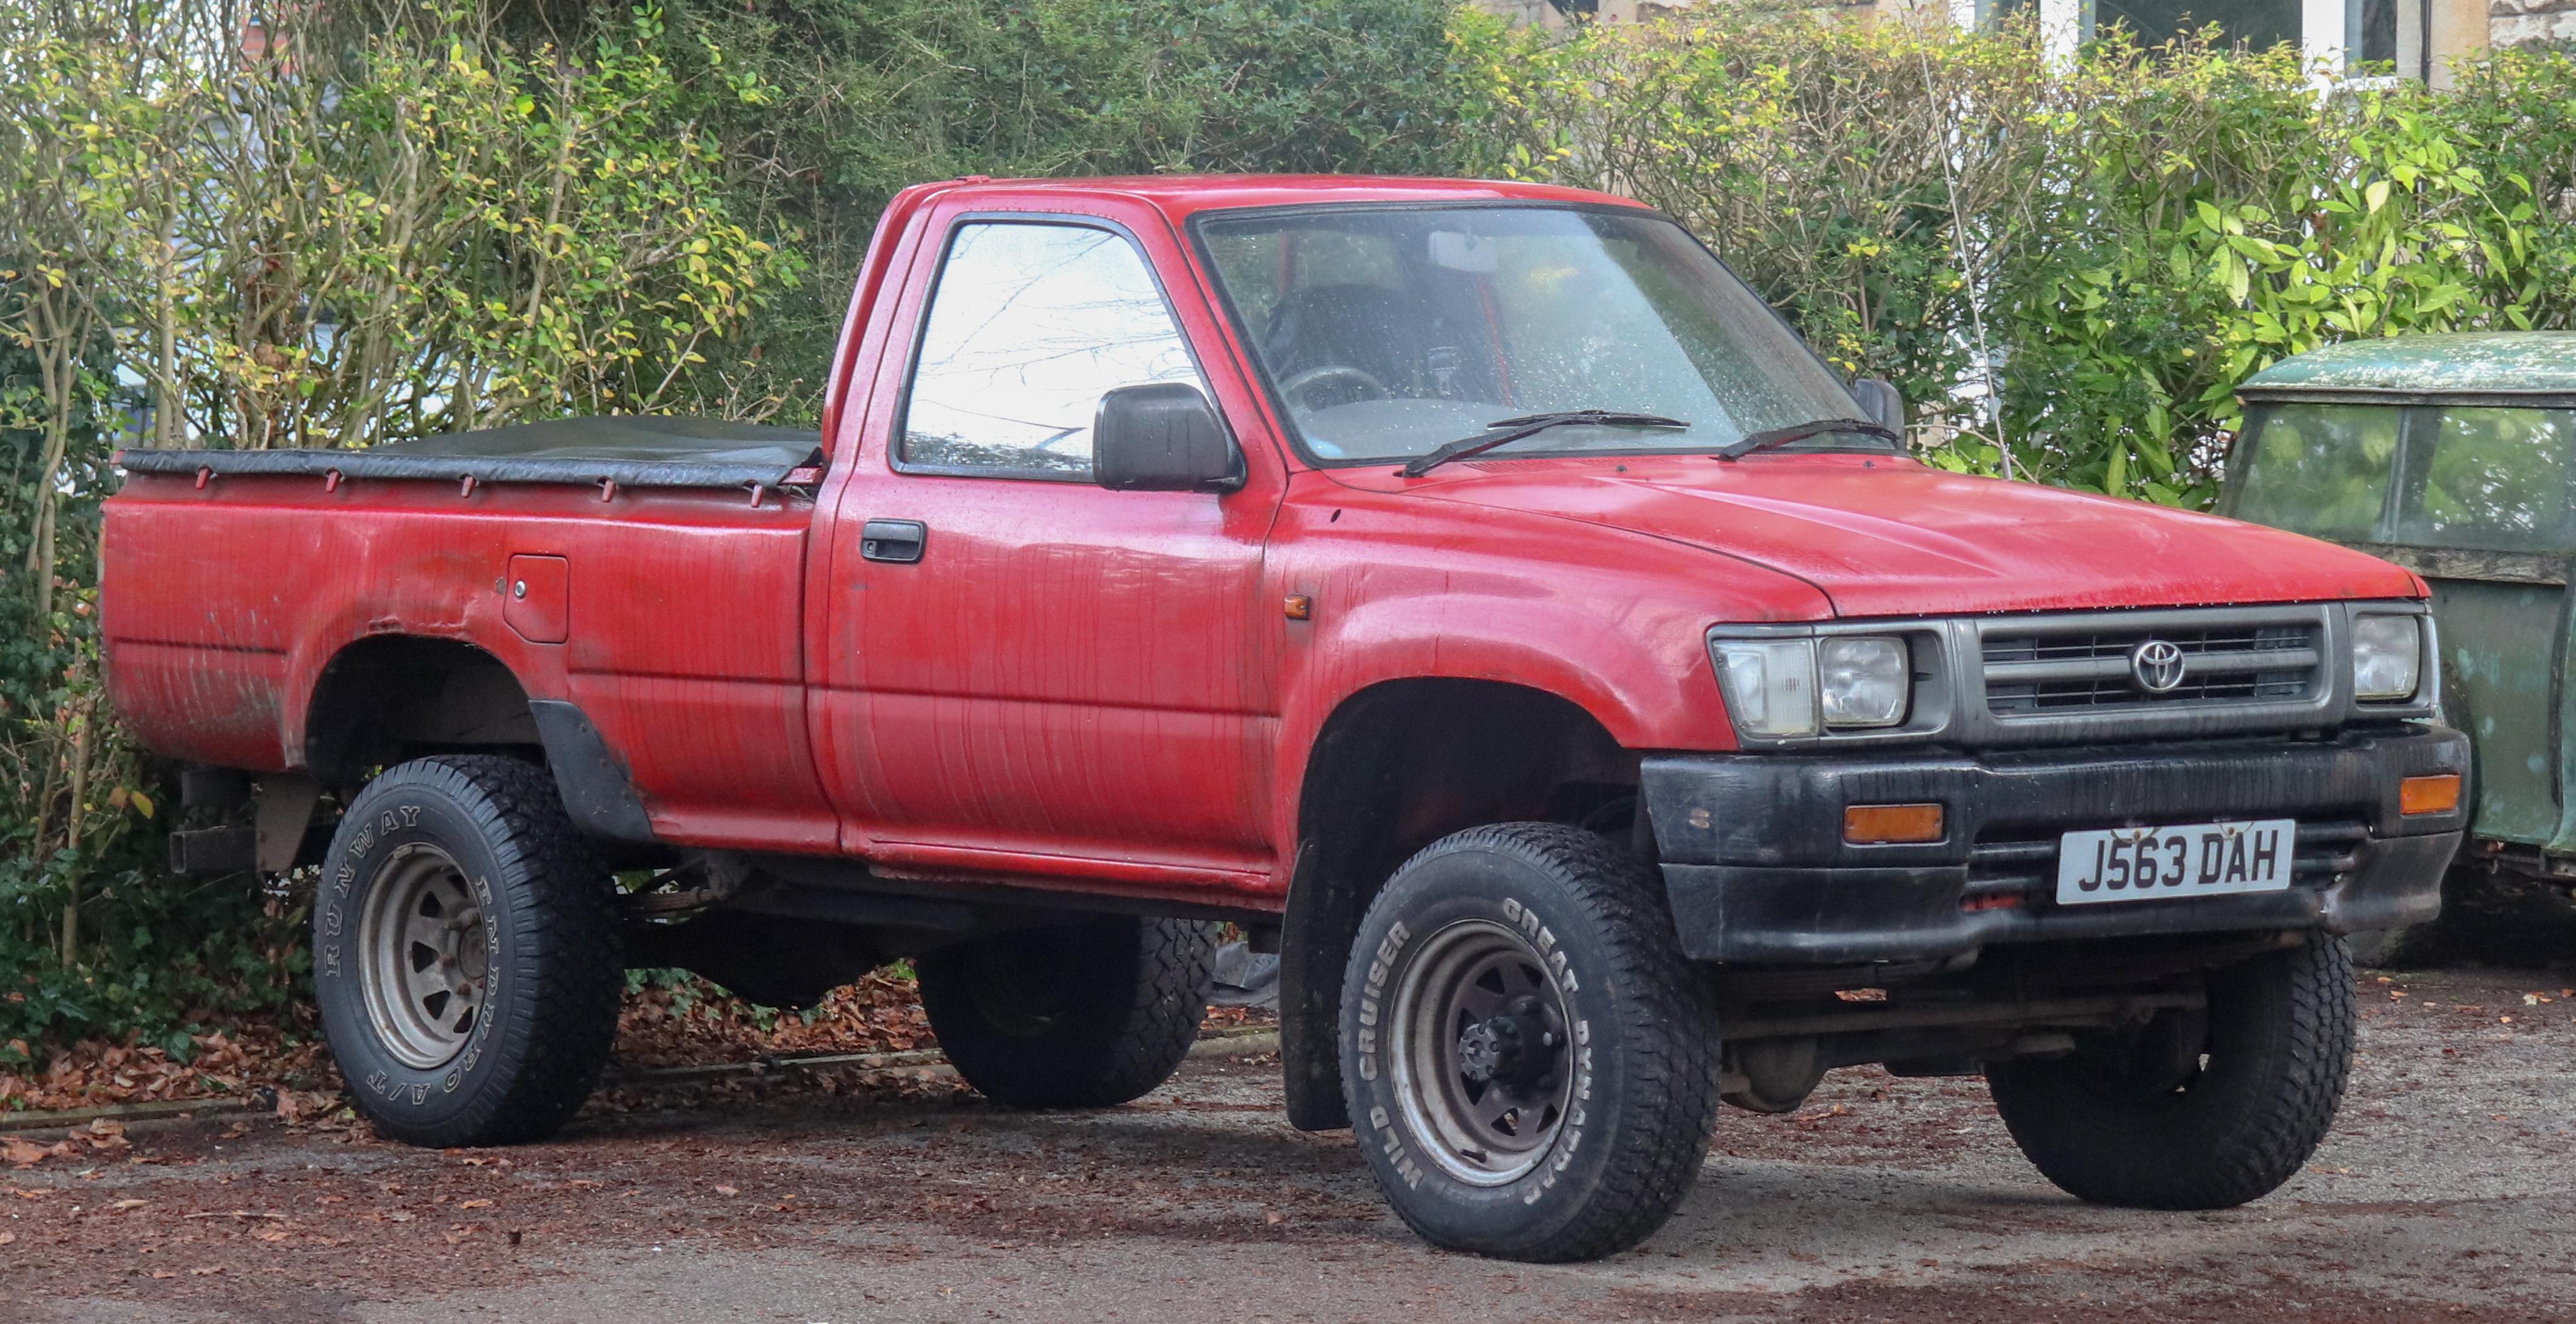 Kelebihan Toyota Hilux 4X4 Spesifikasi